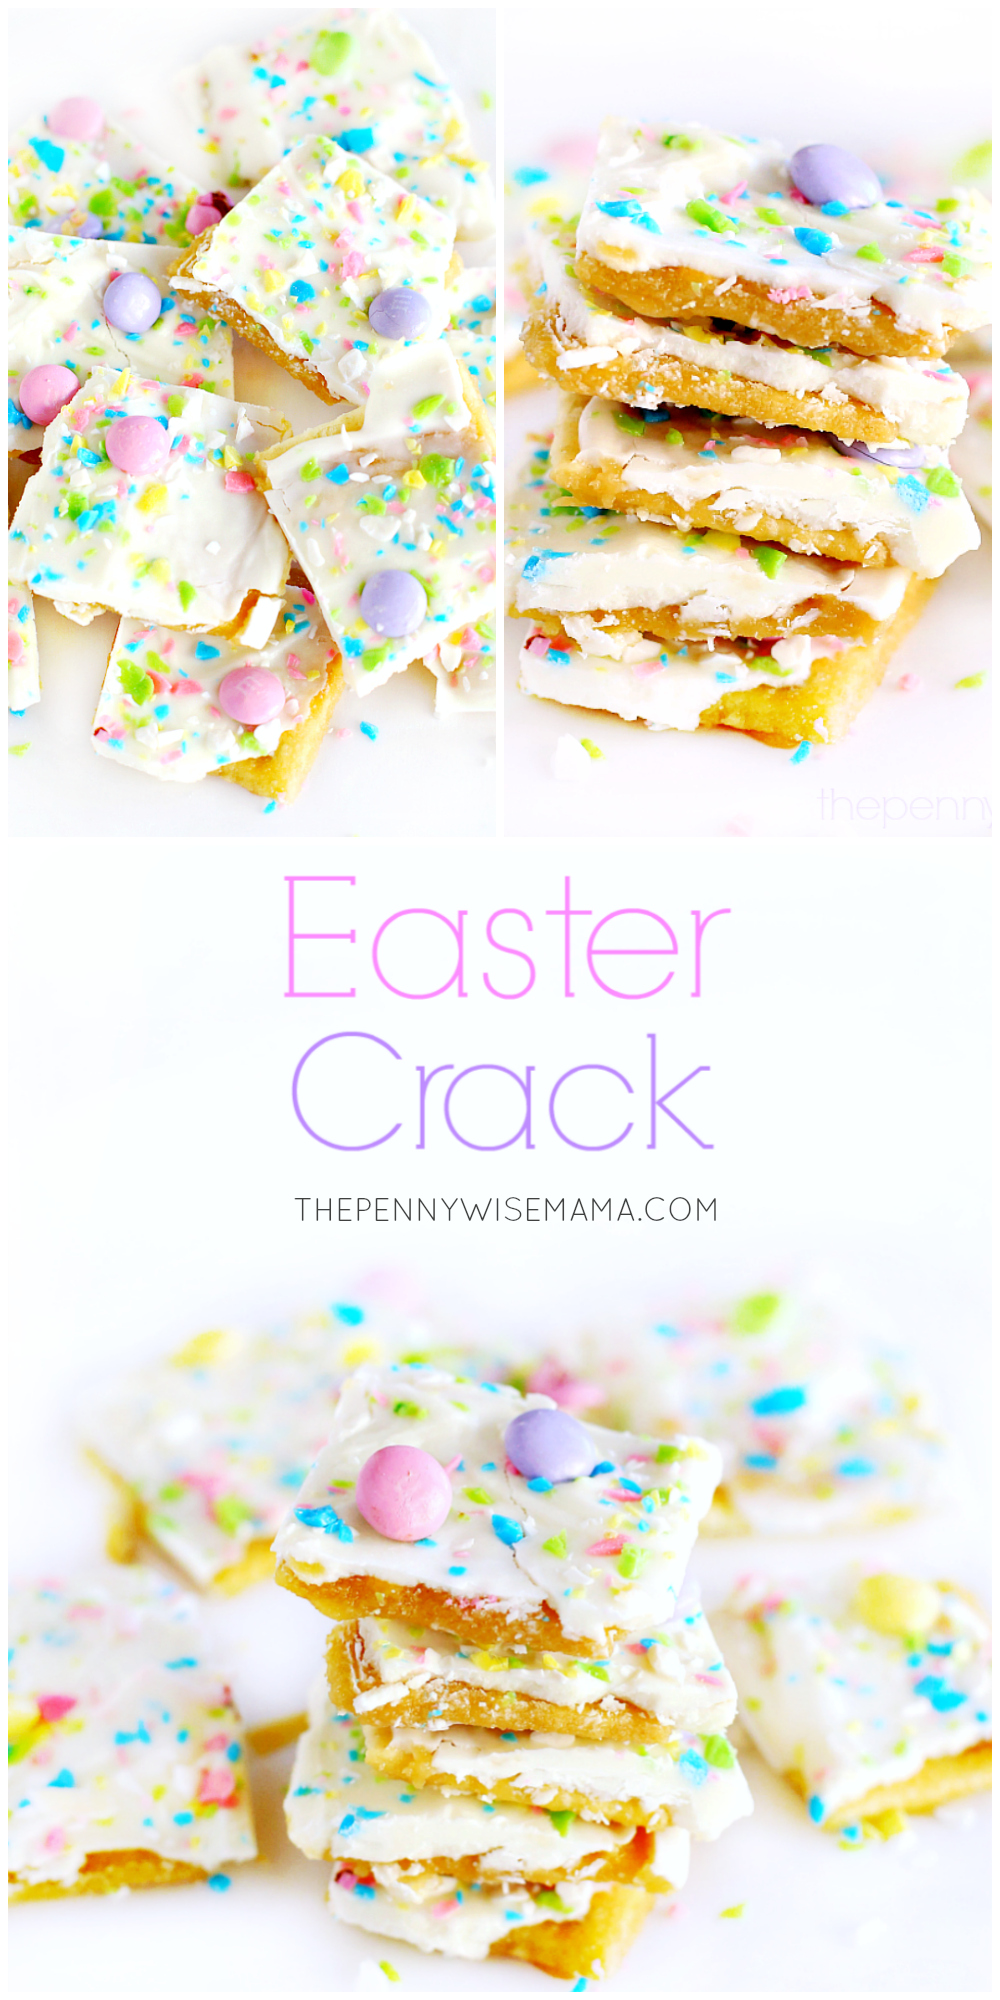 Easter Crack Saltine Toffee Recipe